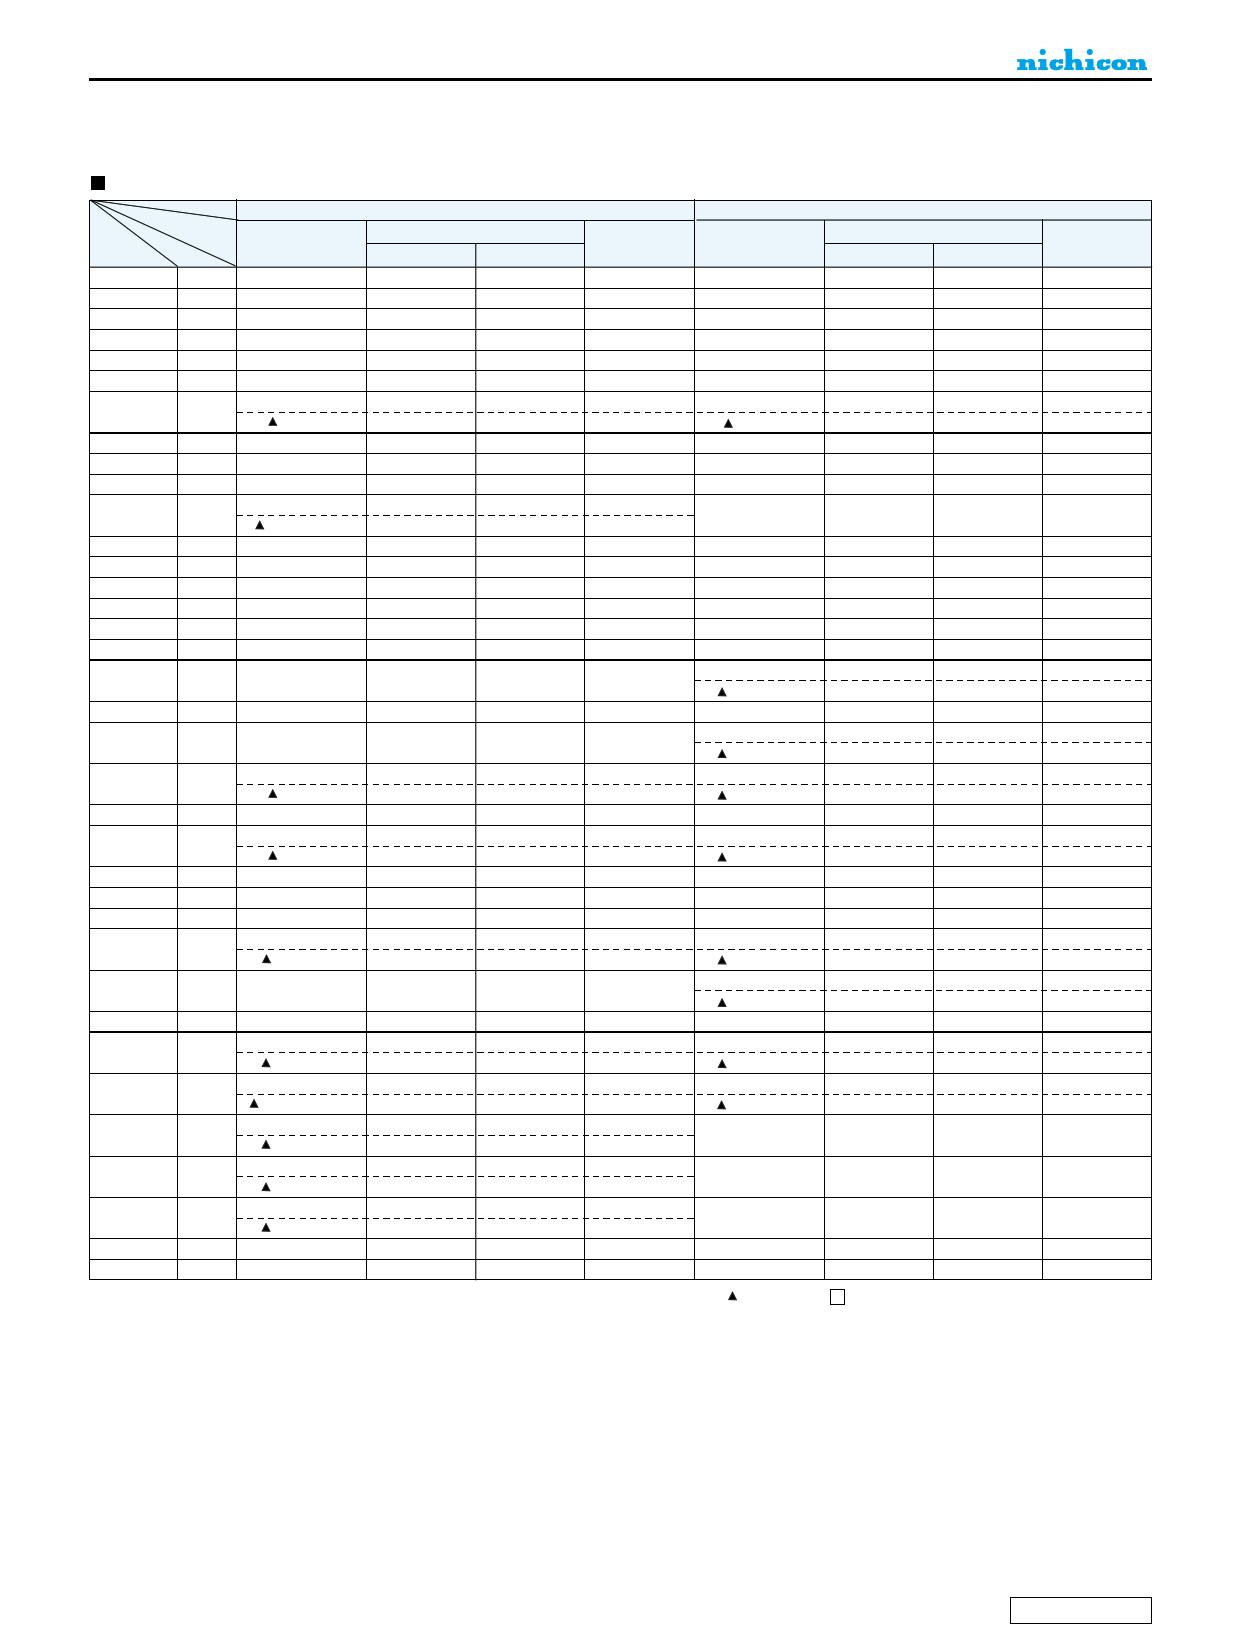 UPW1J102MHD pdf, 반도체, 판매, 대치품